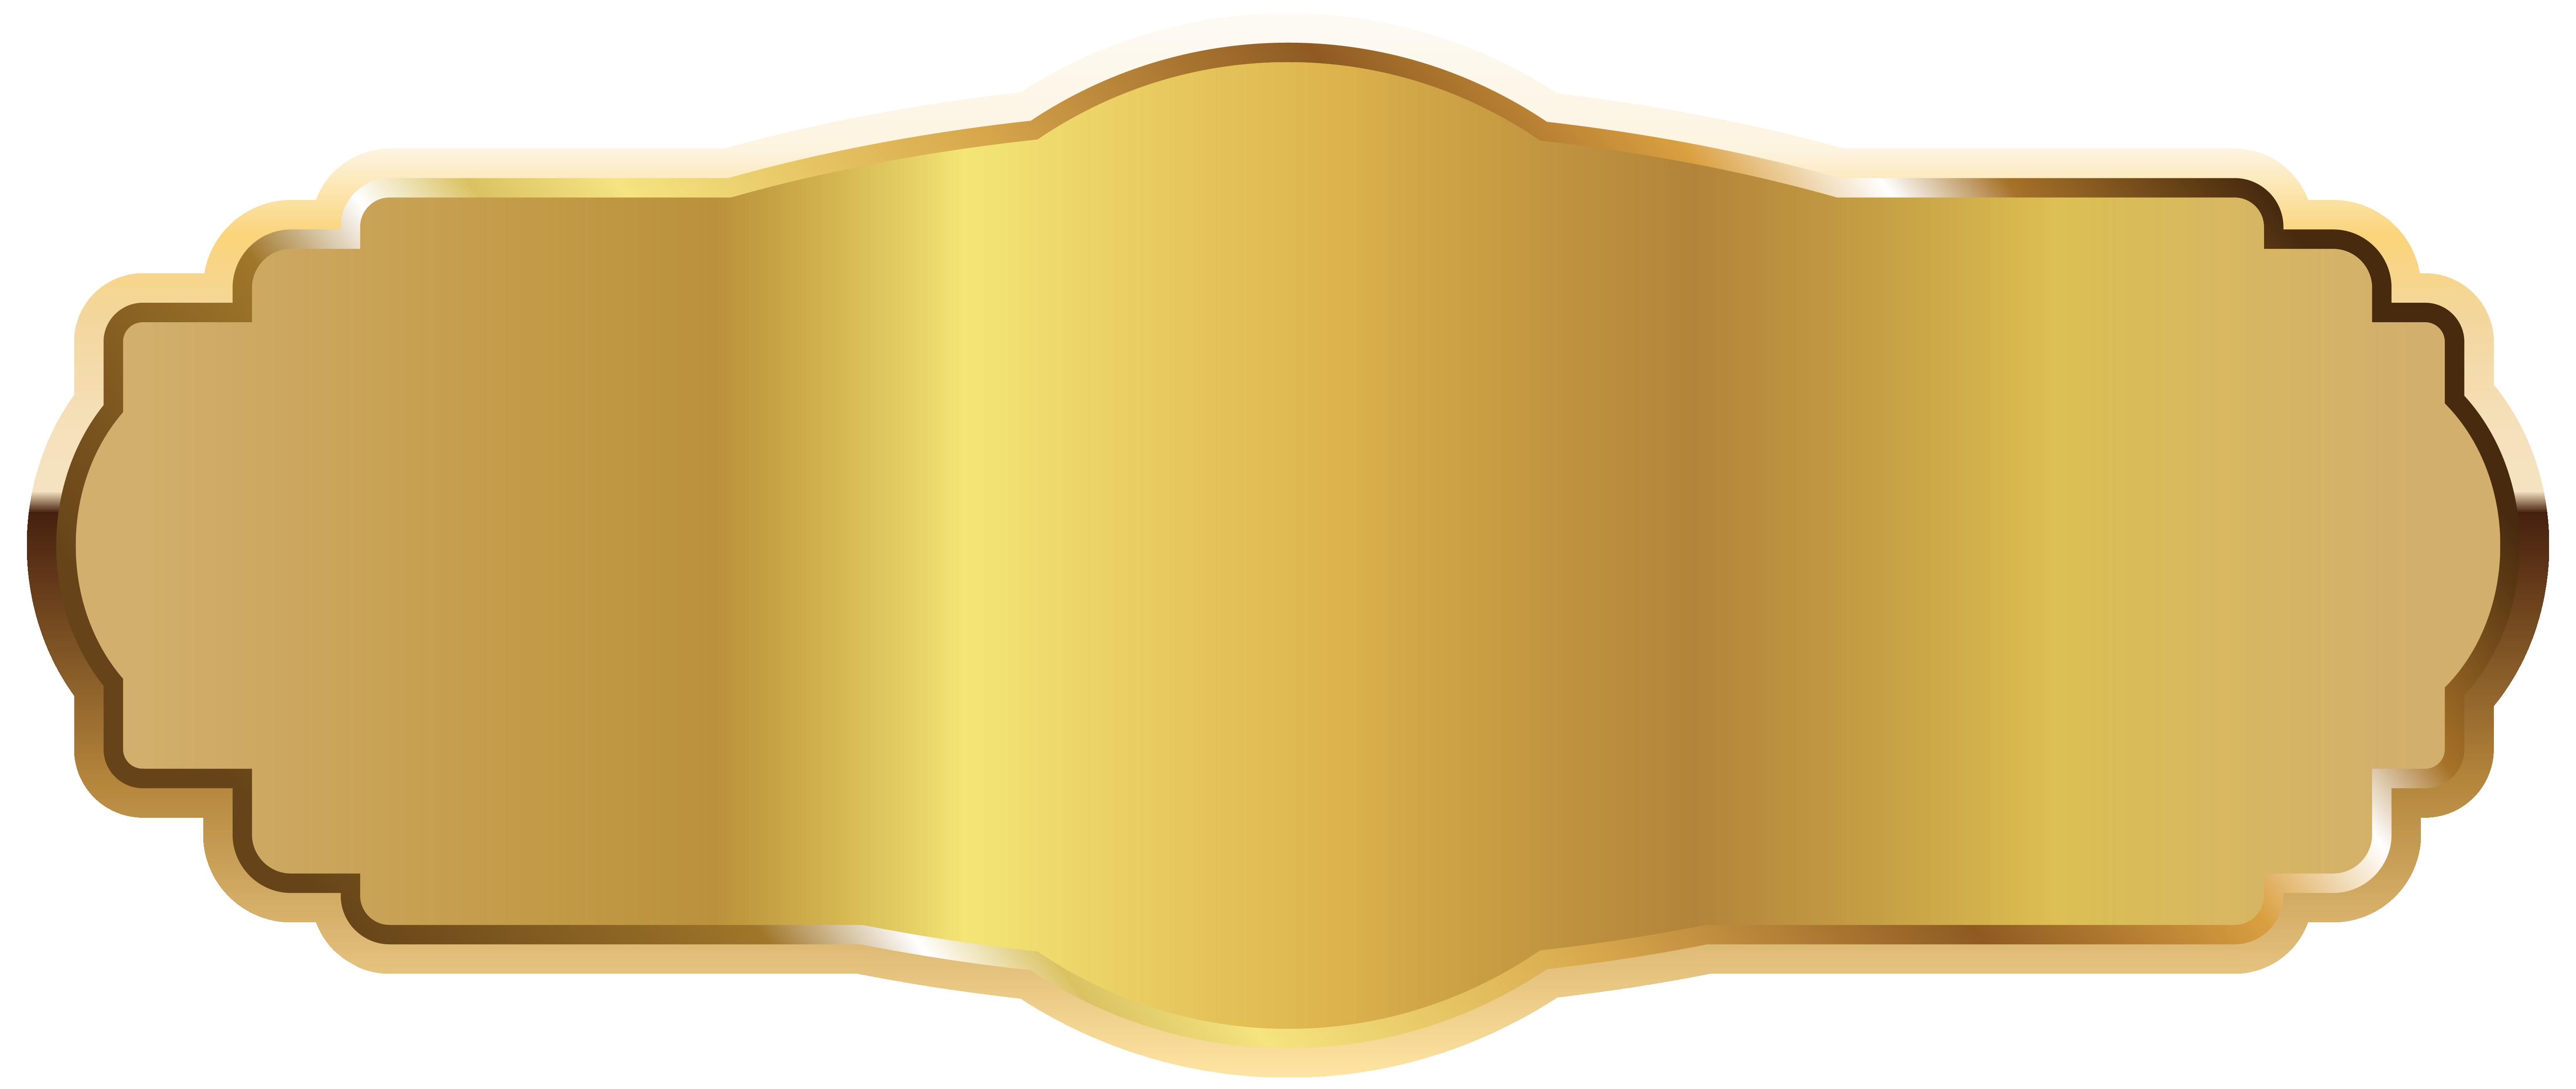 picture transparent download Clipart label. Gold png image labels